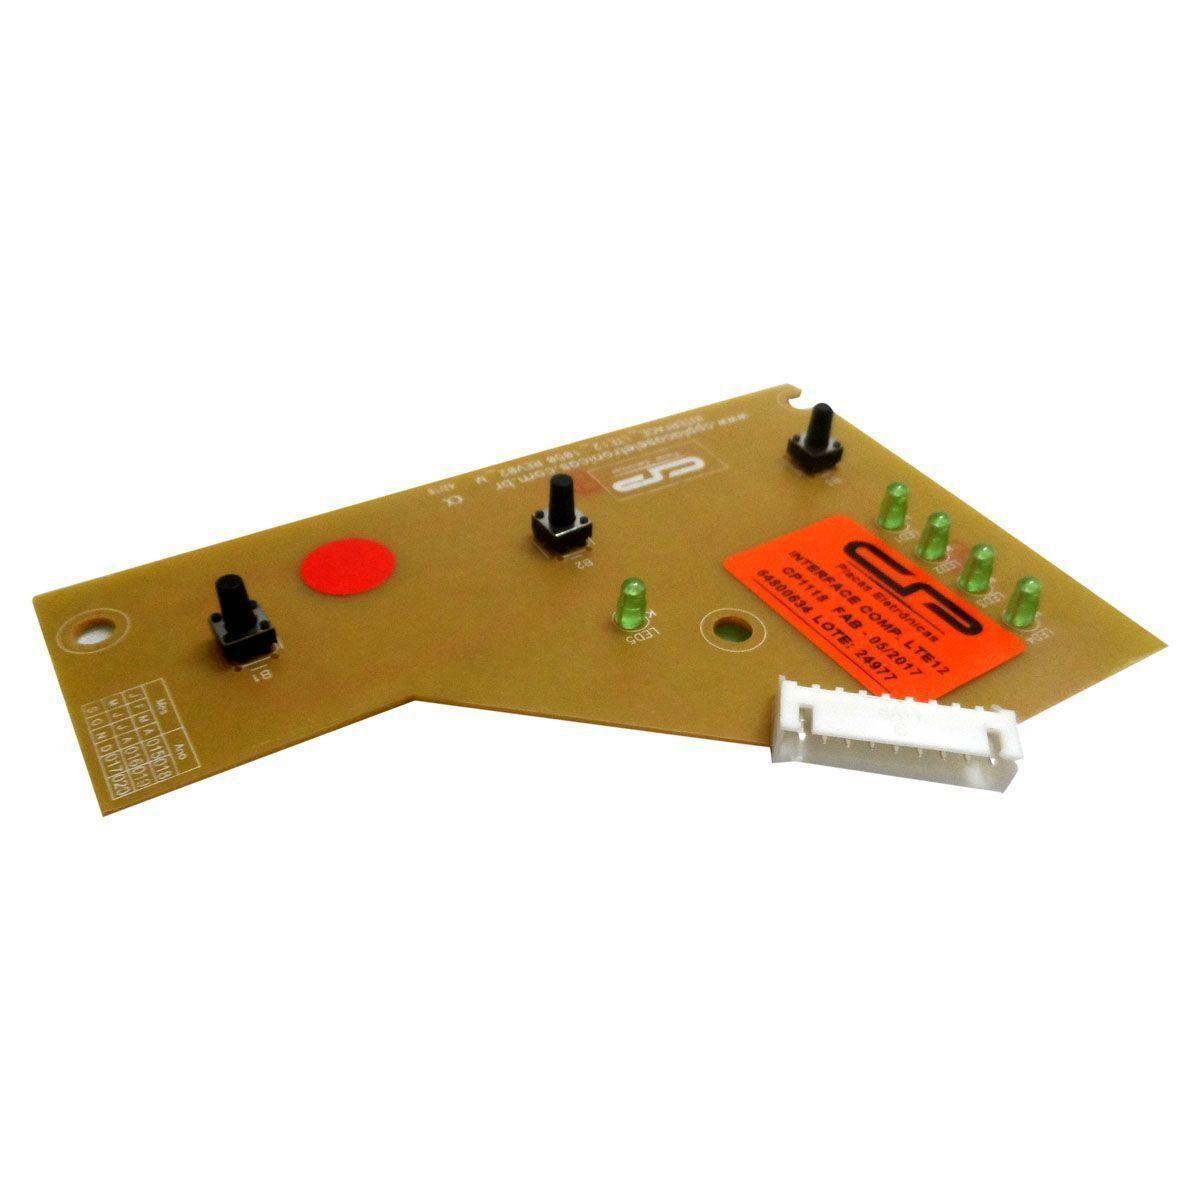 Placa Eletrônica Interface Lavadora Electrolux/C.P